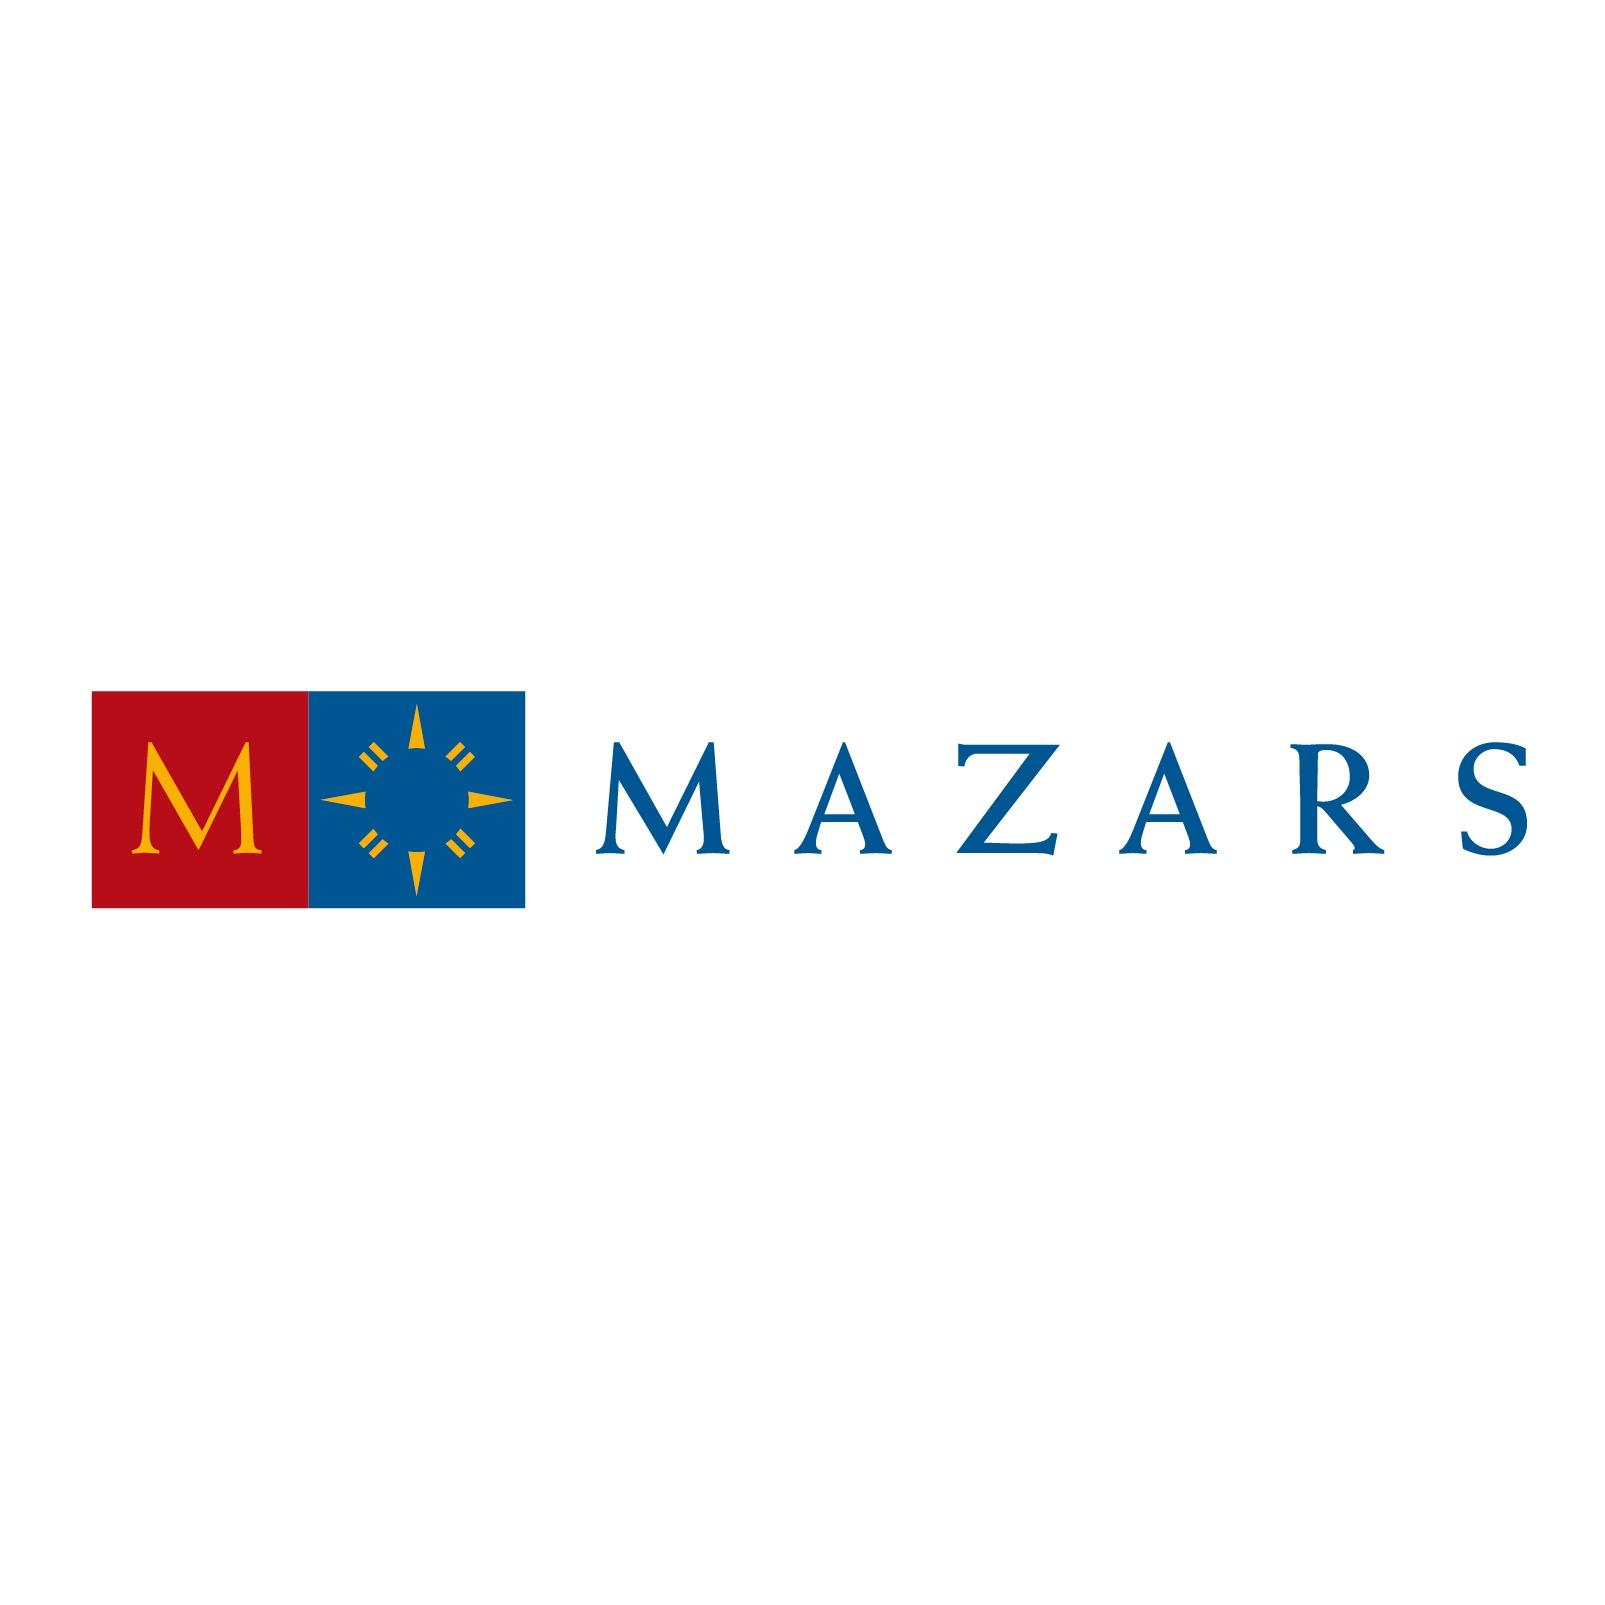 the Mazars logo.